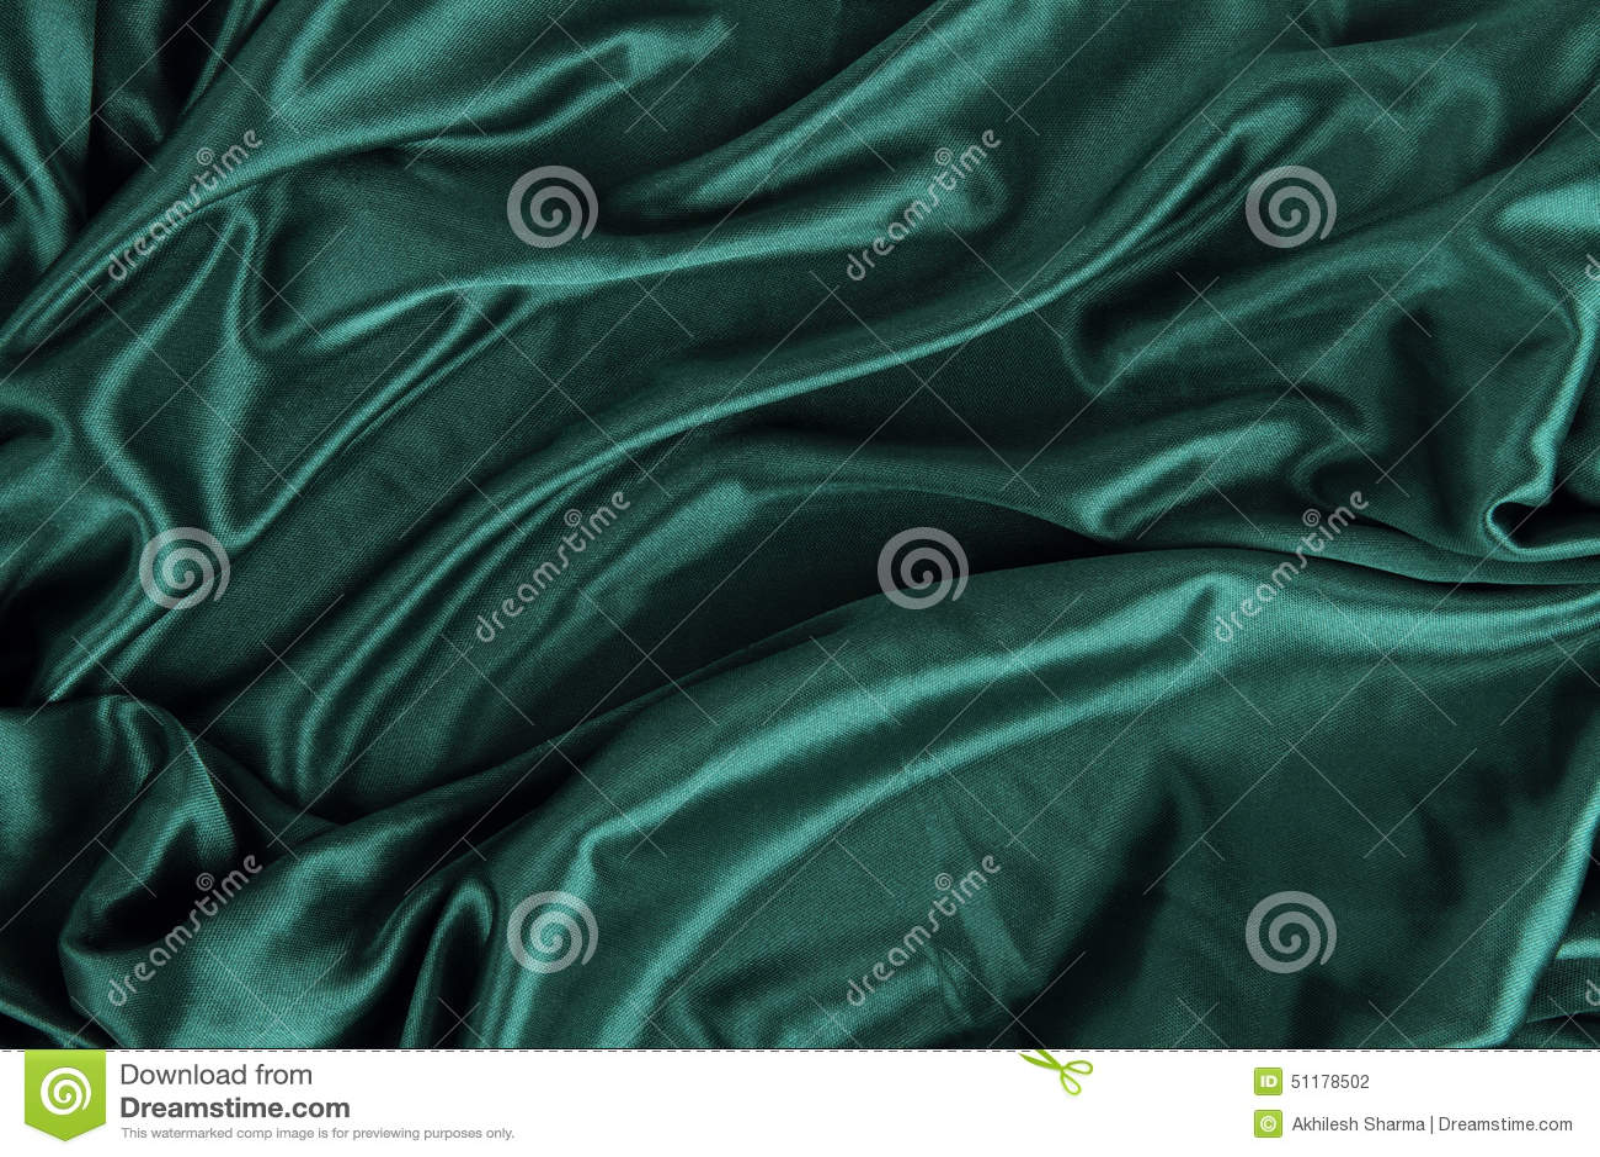 dark green satin silk velvet cloth fabric background stock